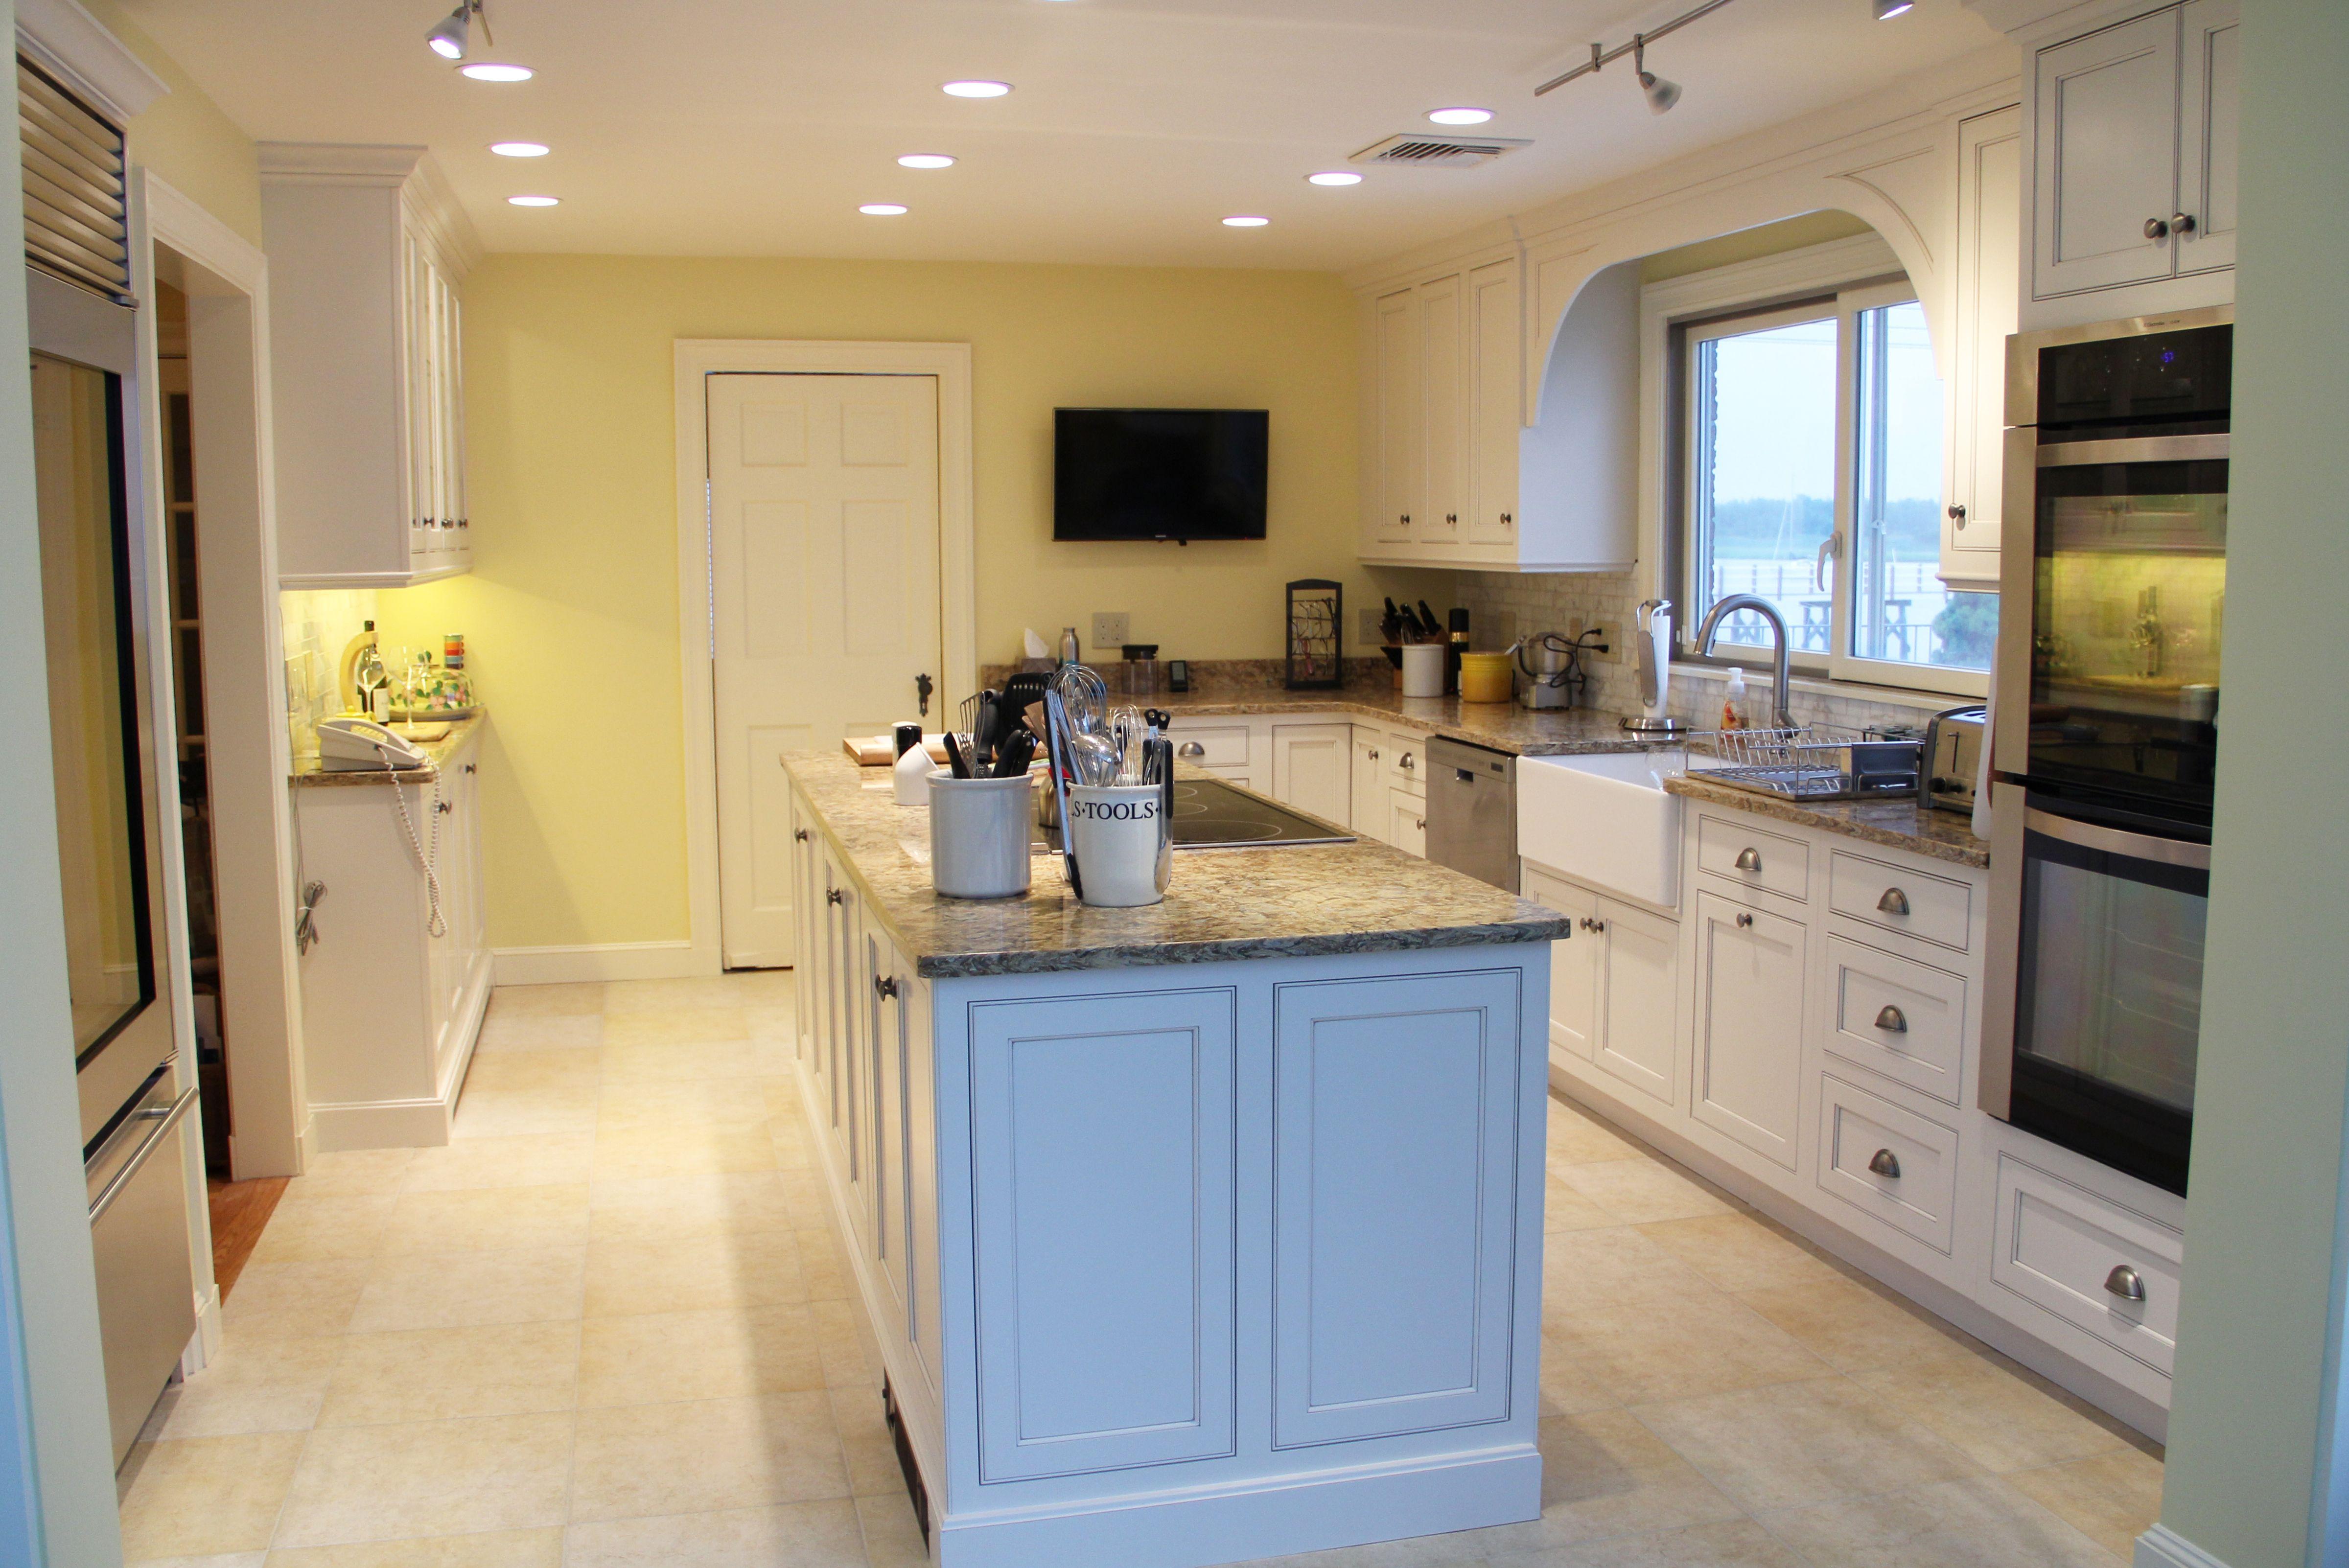 Kitchen And Bath Cabinetry North Shore Ma Omega Cabinetry Kitchen Cabinetry